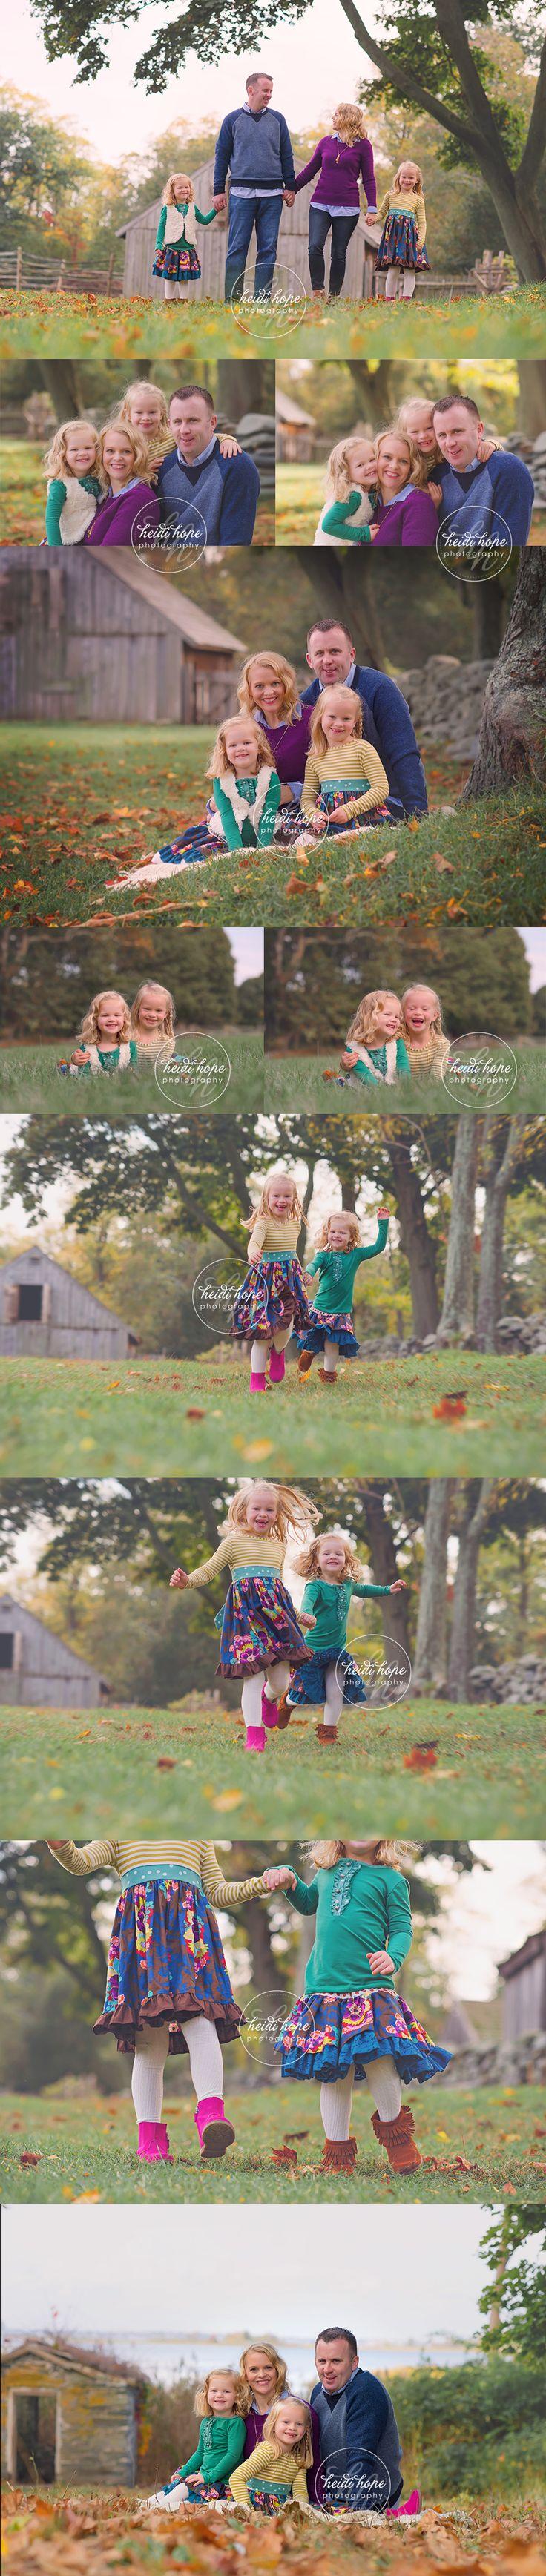 Family portraits at the farm!